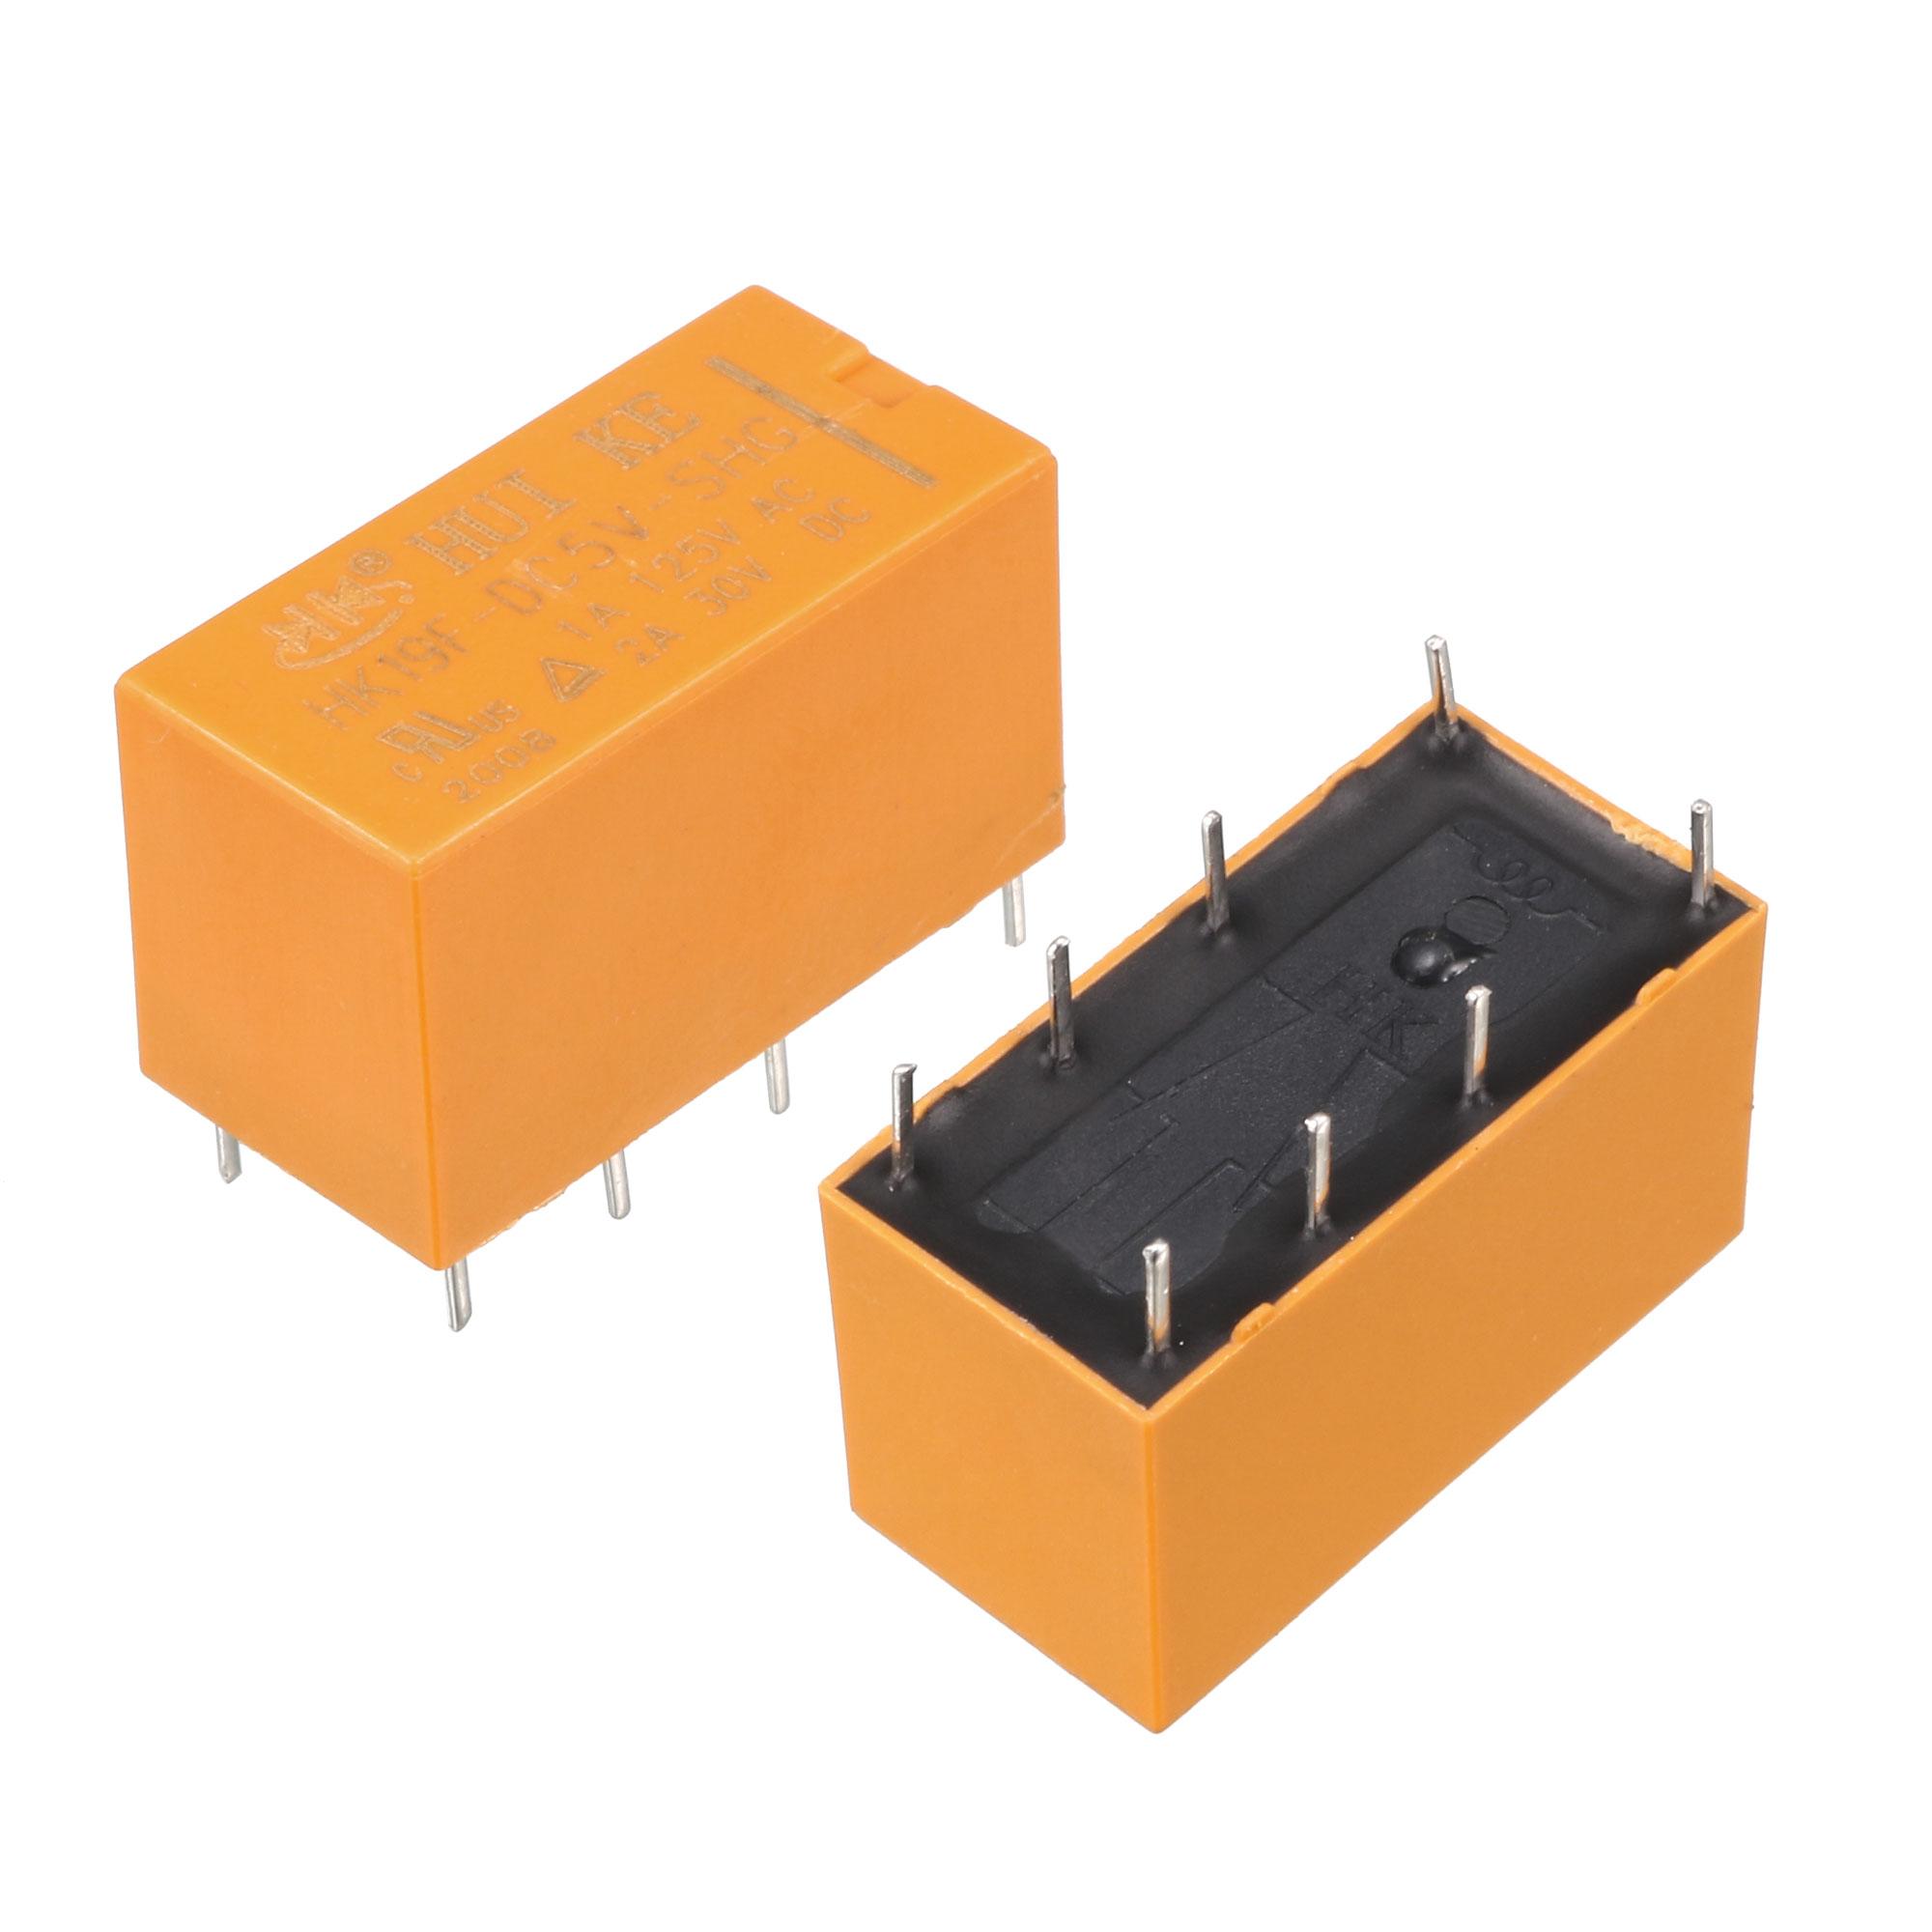 10 x DC 5V Coil 125V/1A DC 30V/2A AC 2A/30V DC 8 Pins DPDT Power Relay HK19F